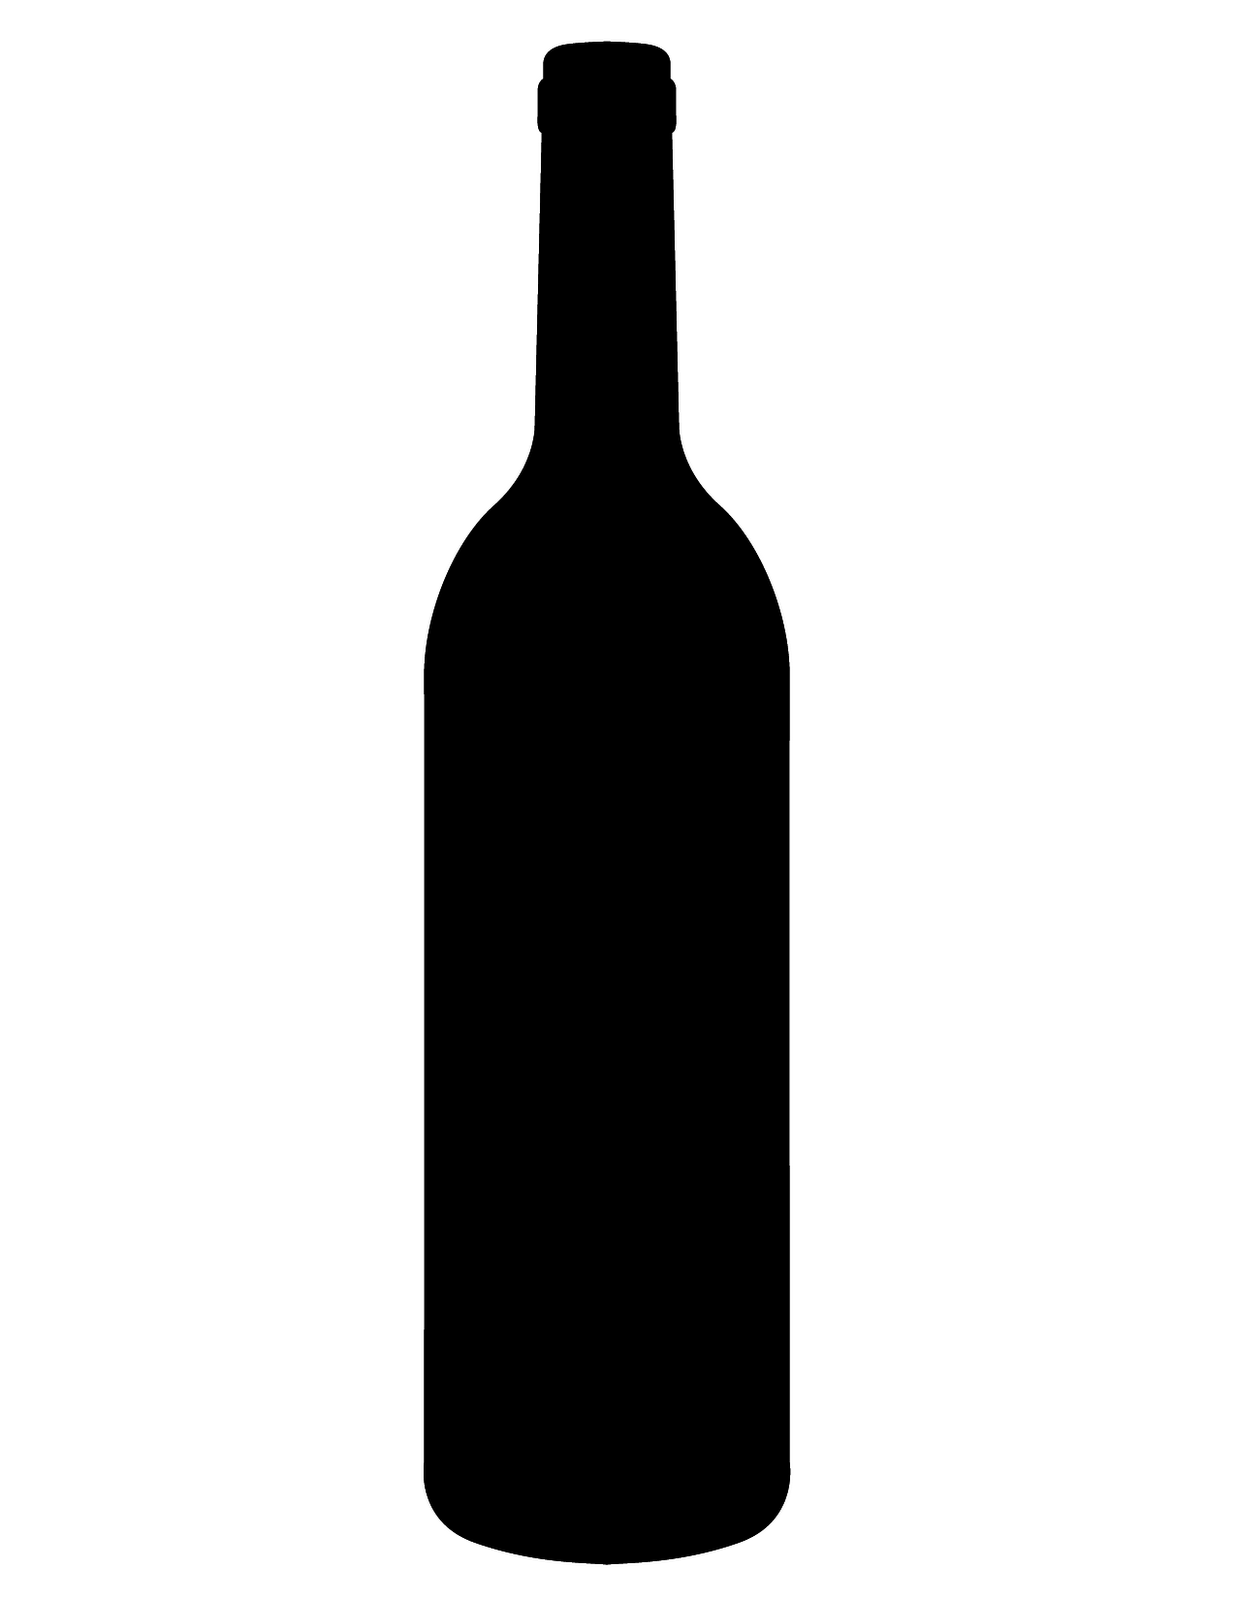 $60 Bottle (Vision Loss Alliance)